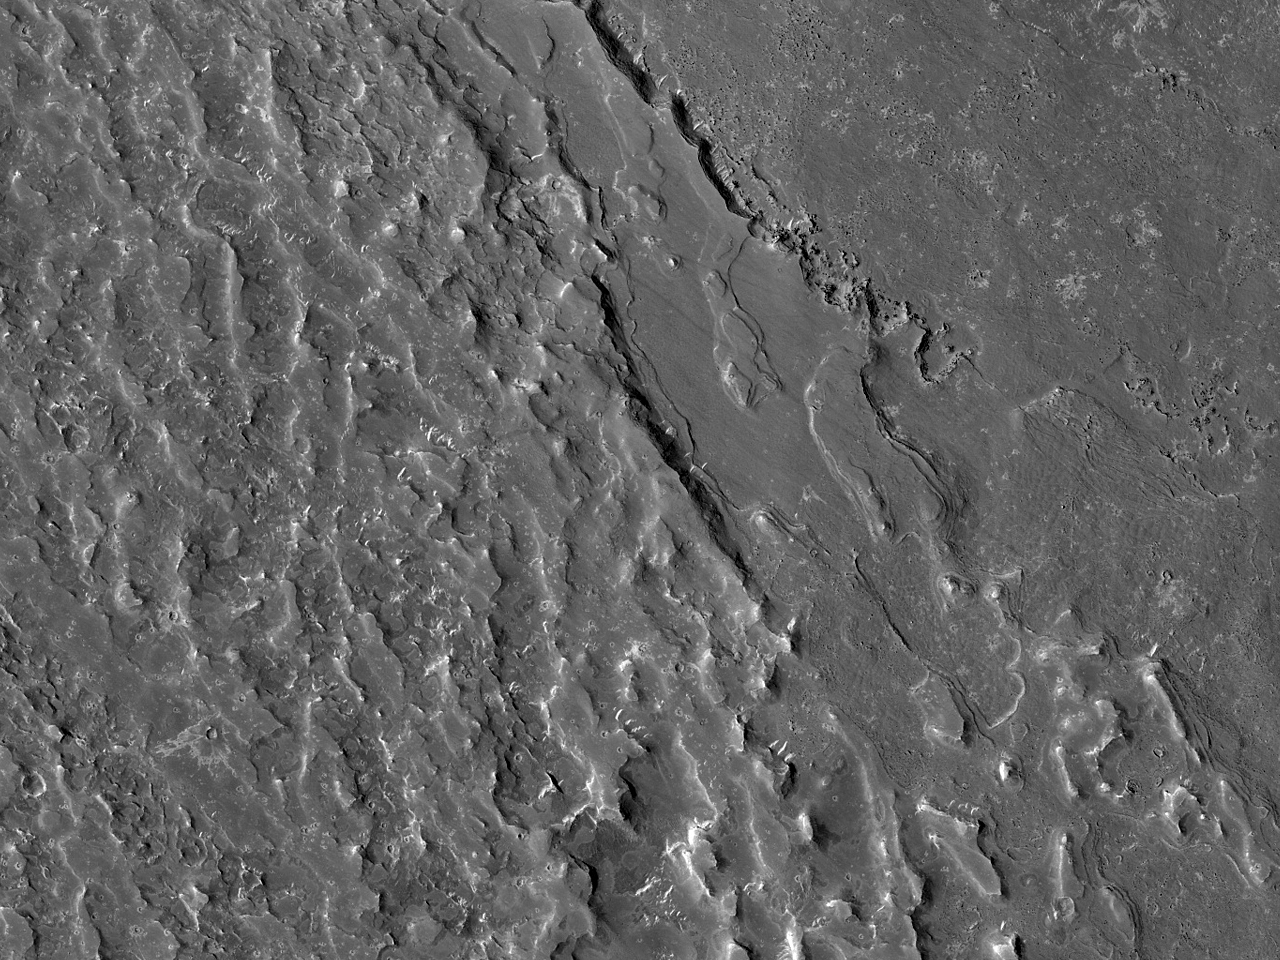 Лава и канал на юге равнины Elysium Planitia